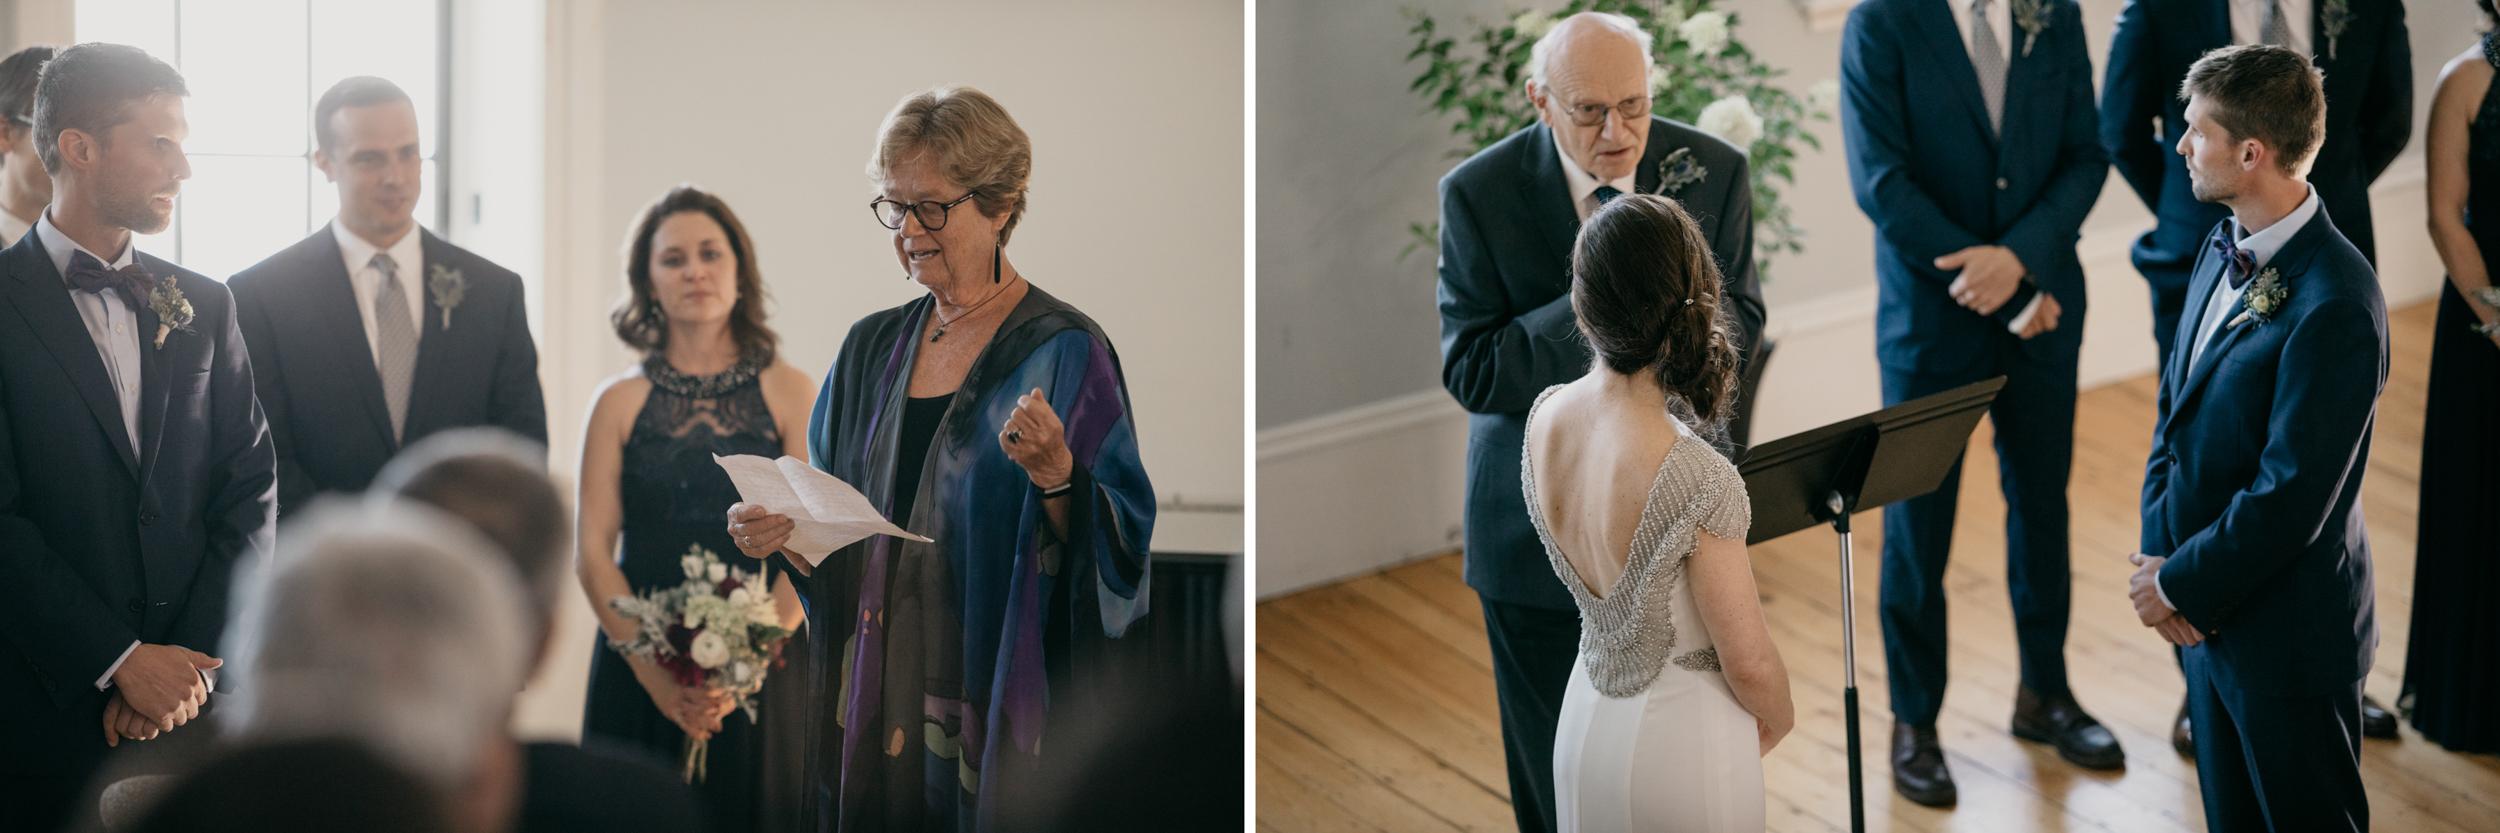 Mackenzie_Collins_Maine_wedding_in_Rockport_Union_hall_Nina_June_014.jpg